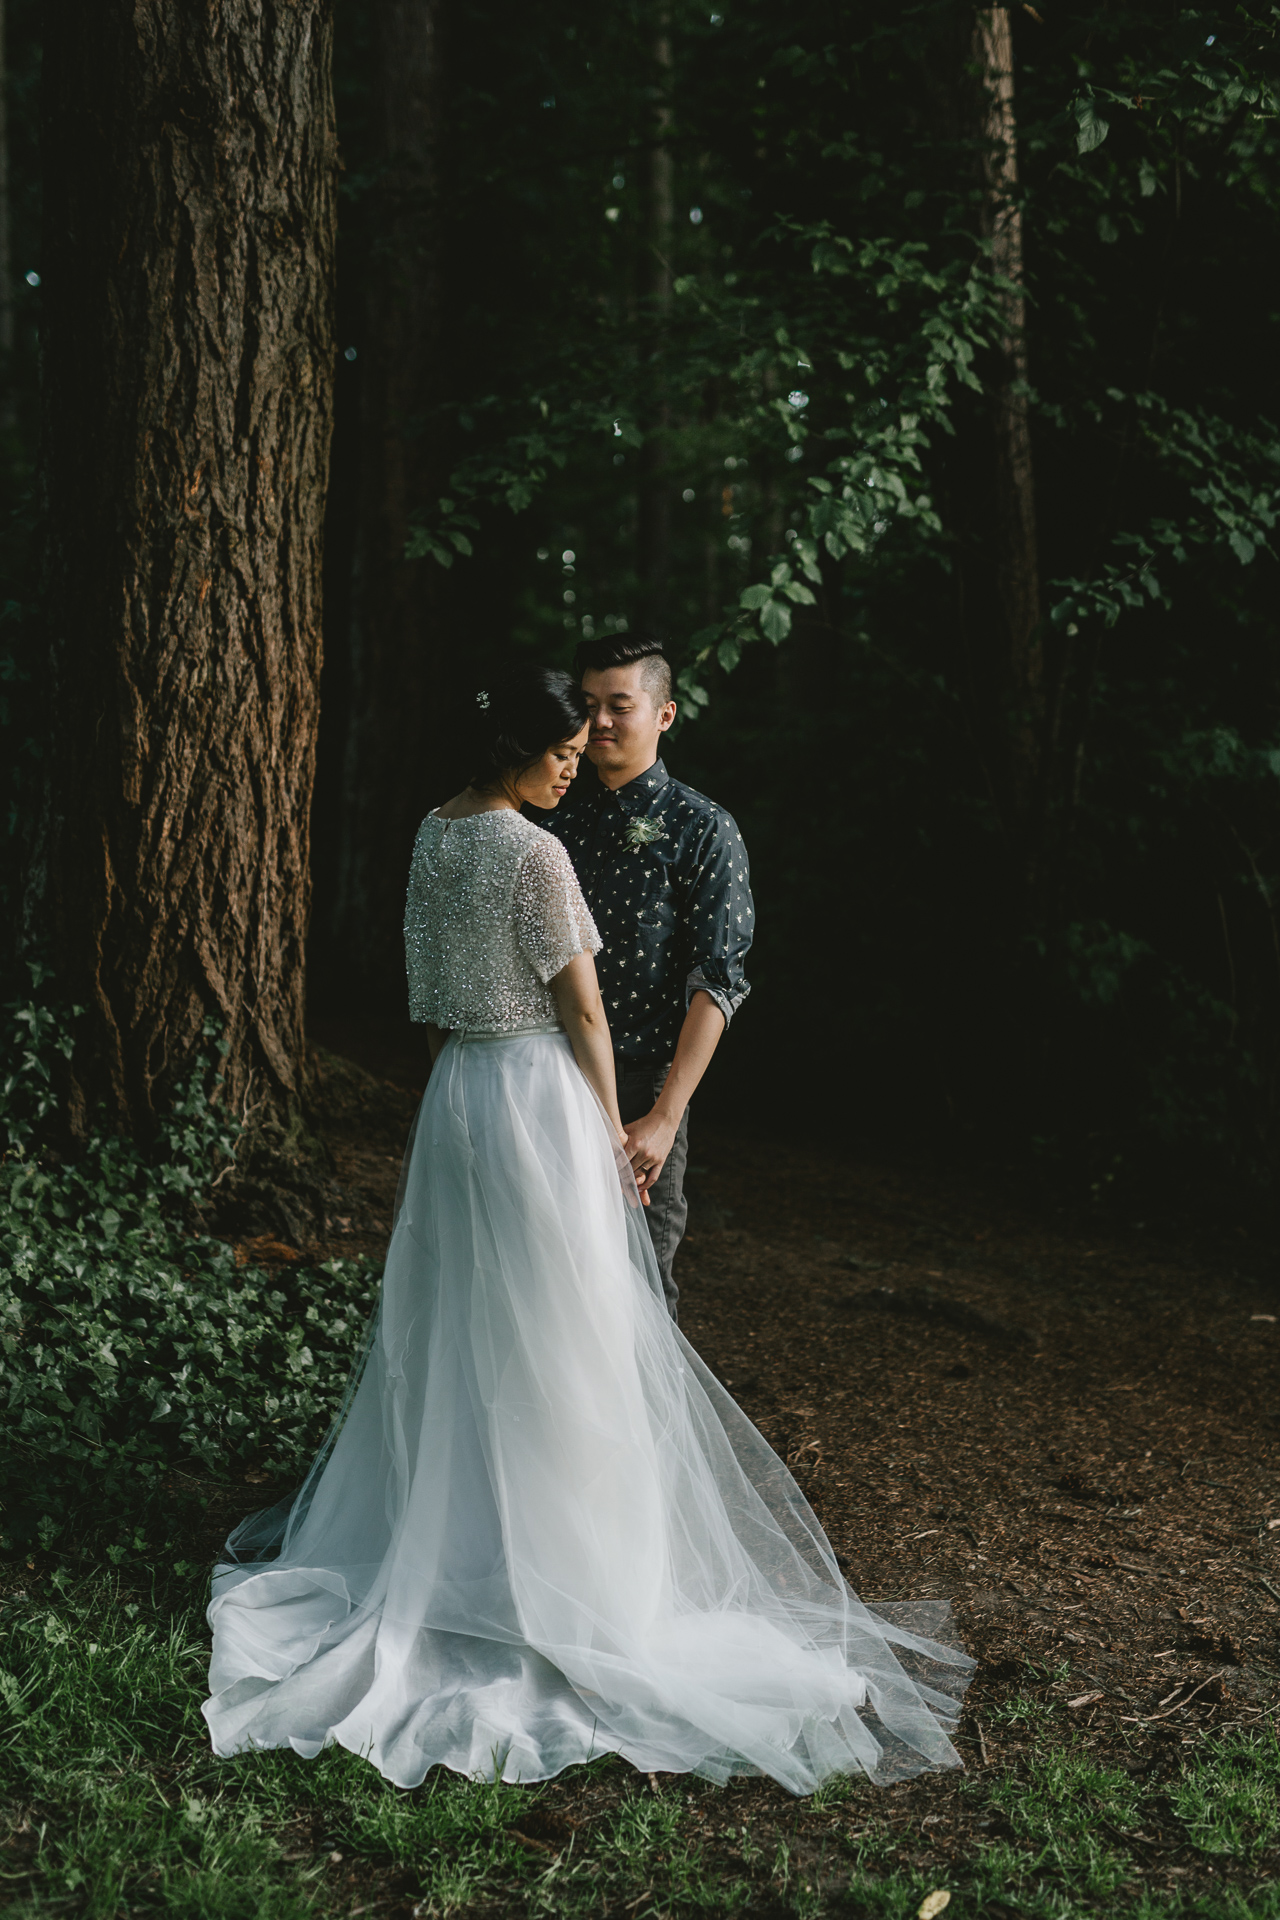 jess-hunter-seattle-artistic-wedding-photographer-5833.jpg